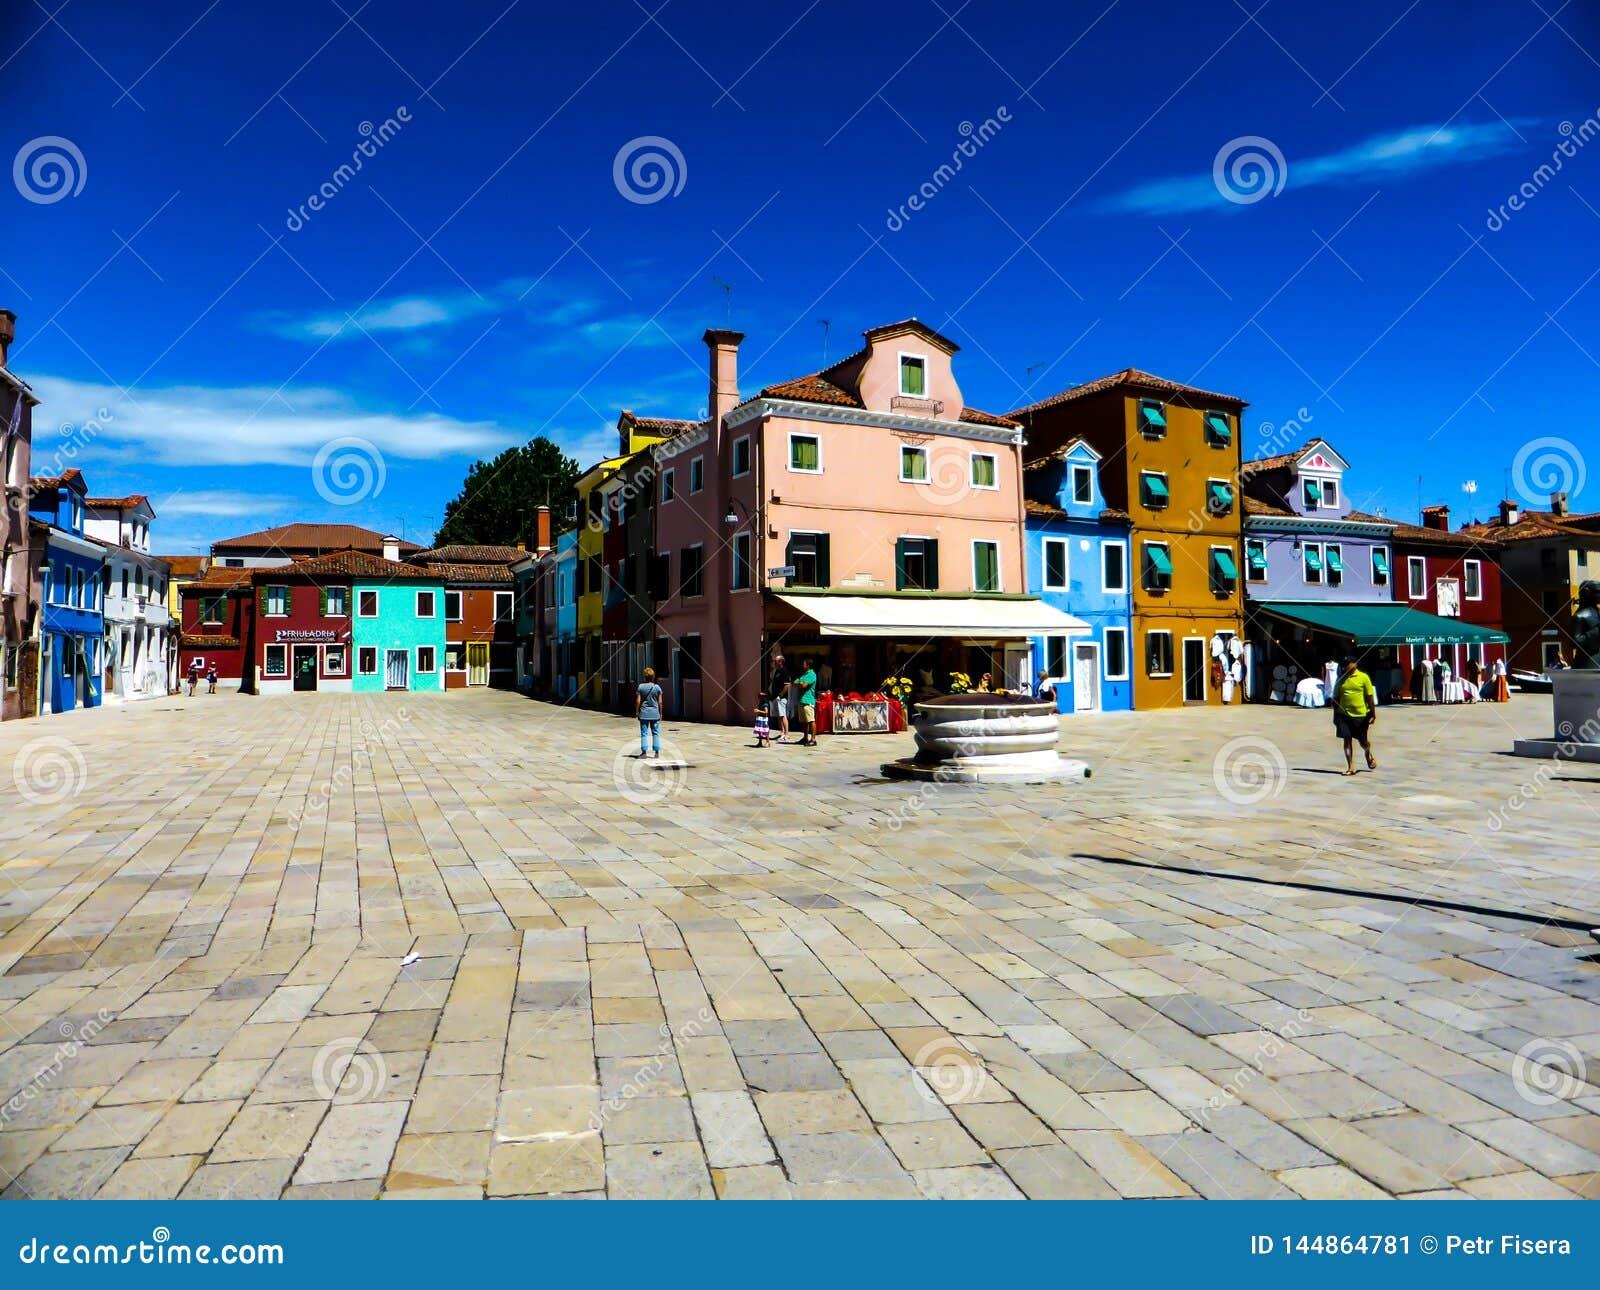 Belle photo de Murano - Venise Italie